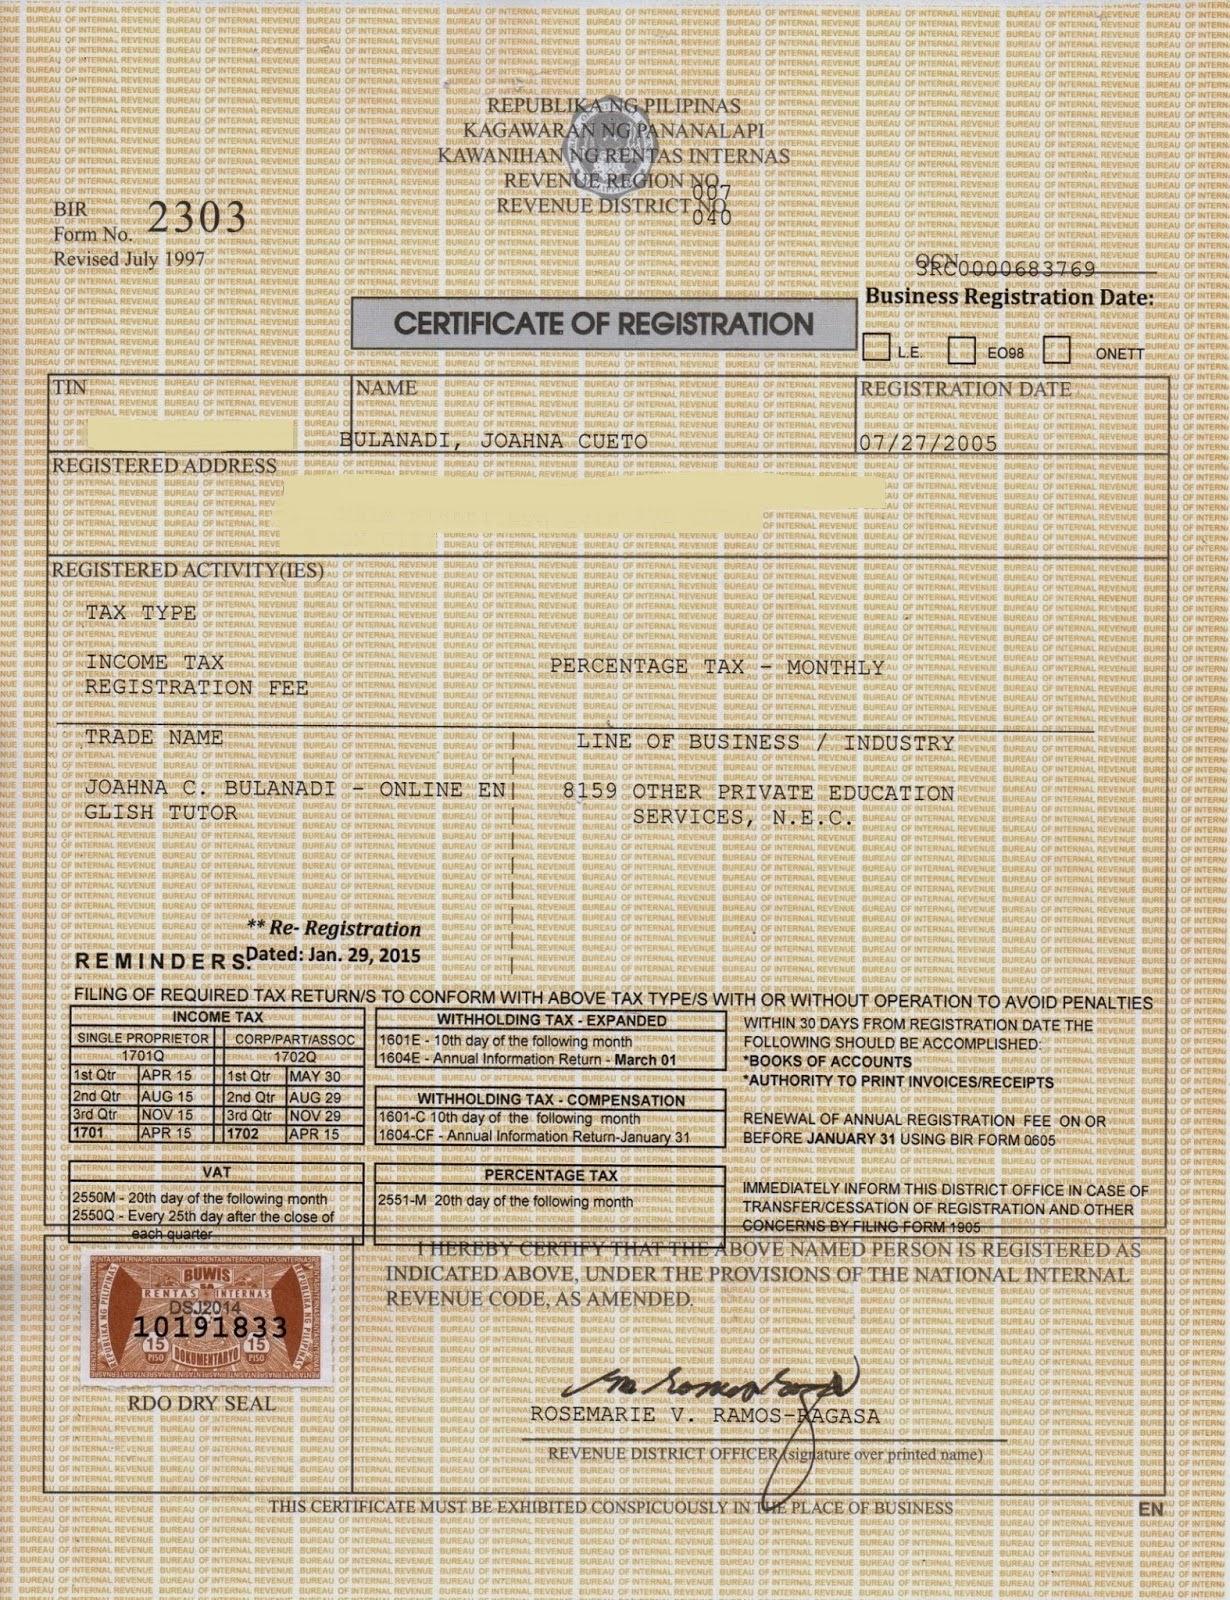 rand corporation researcher application process